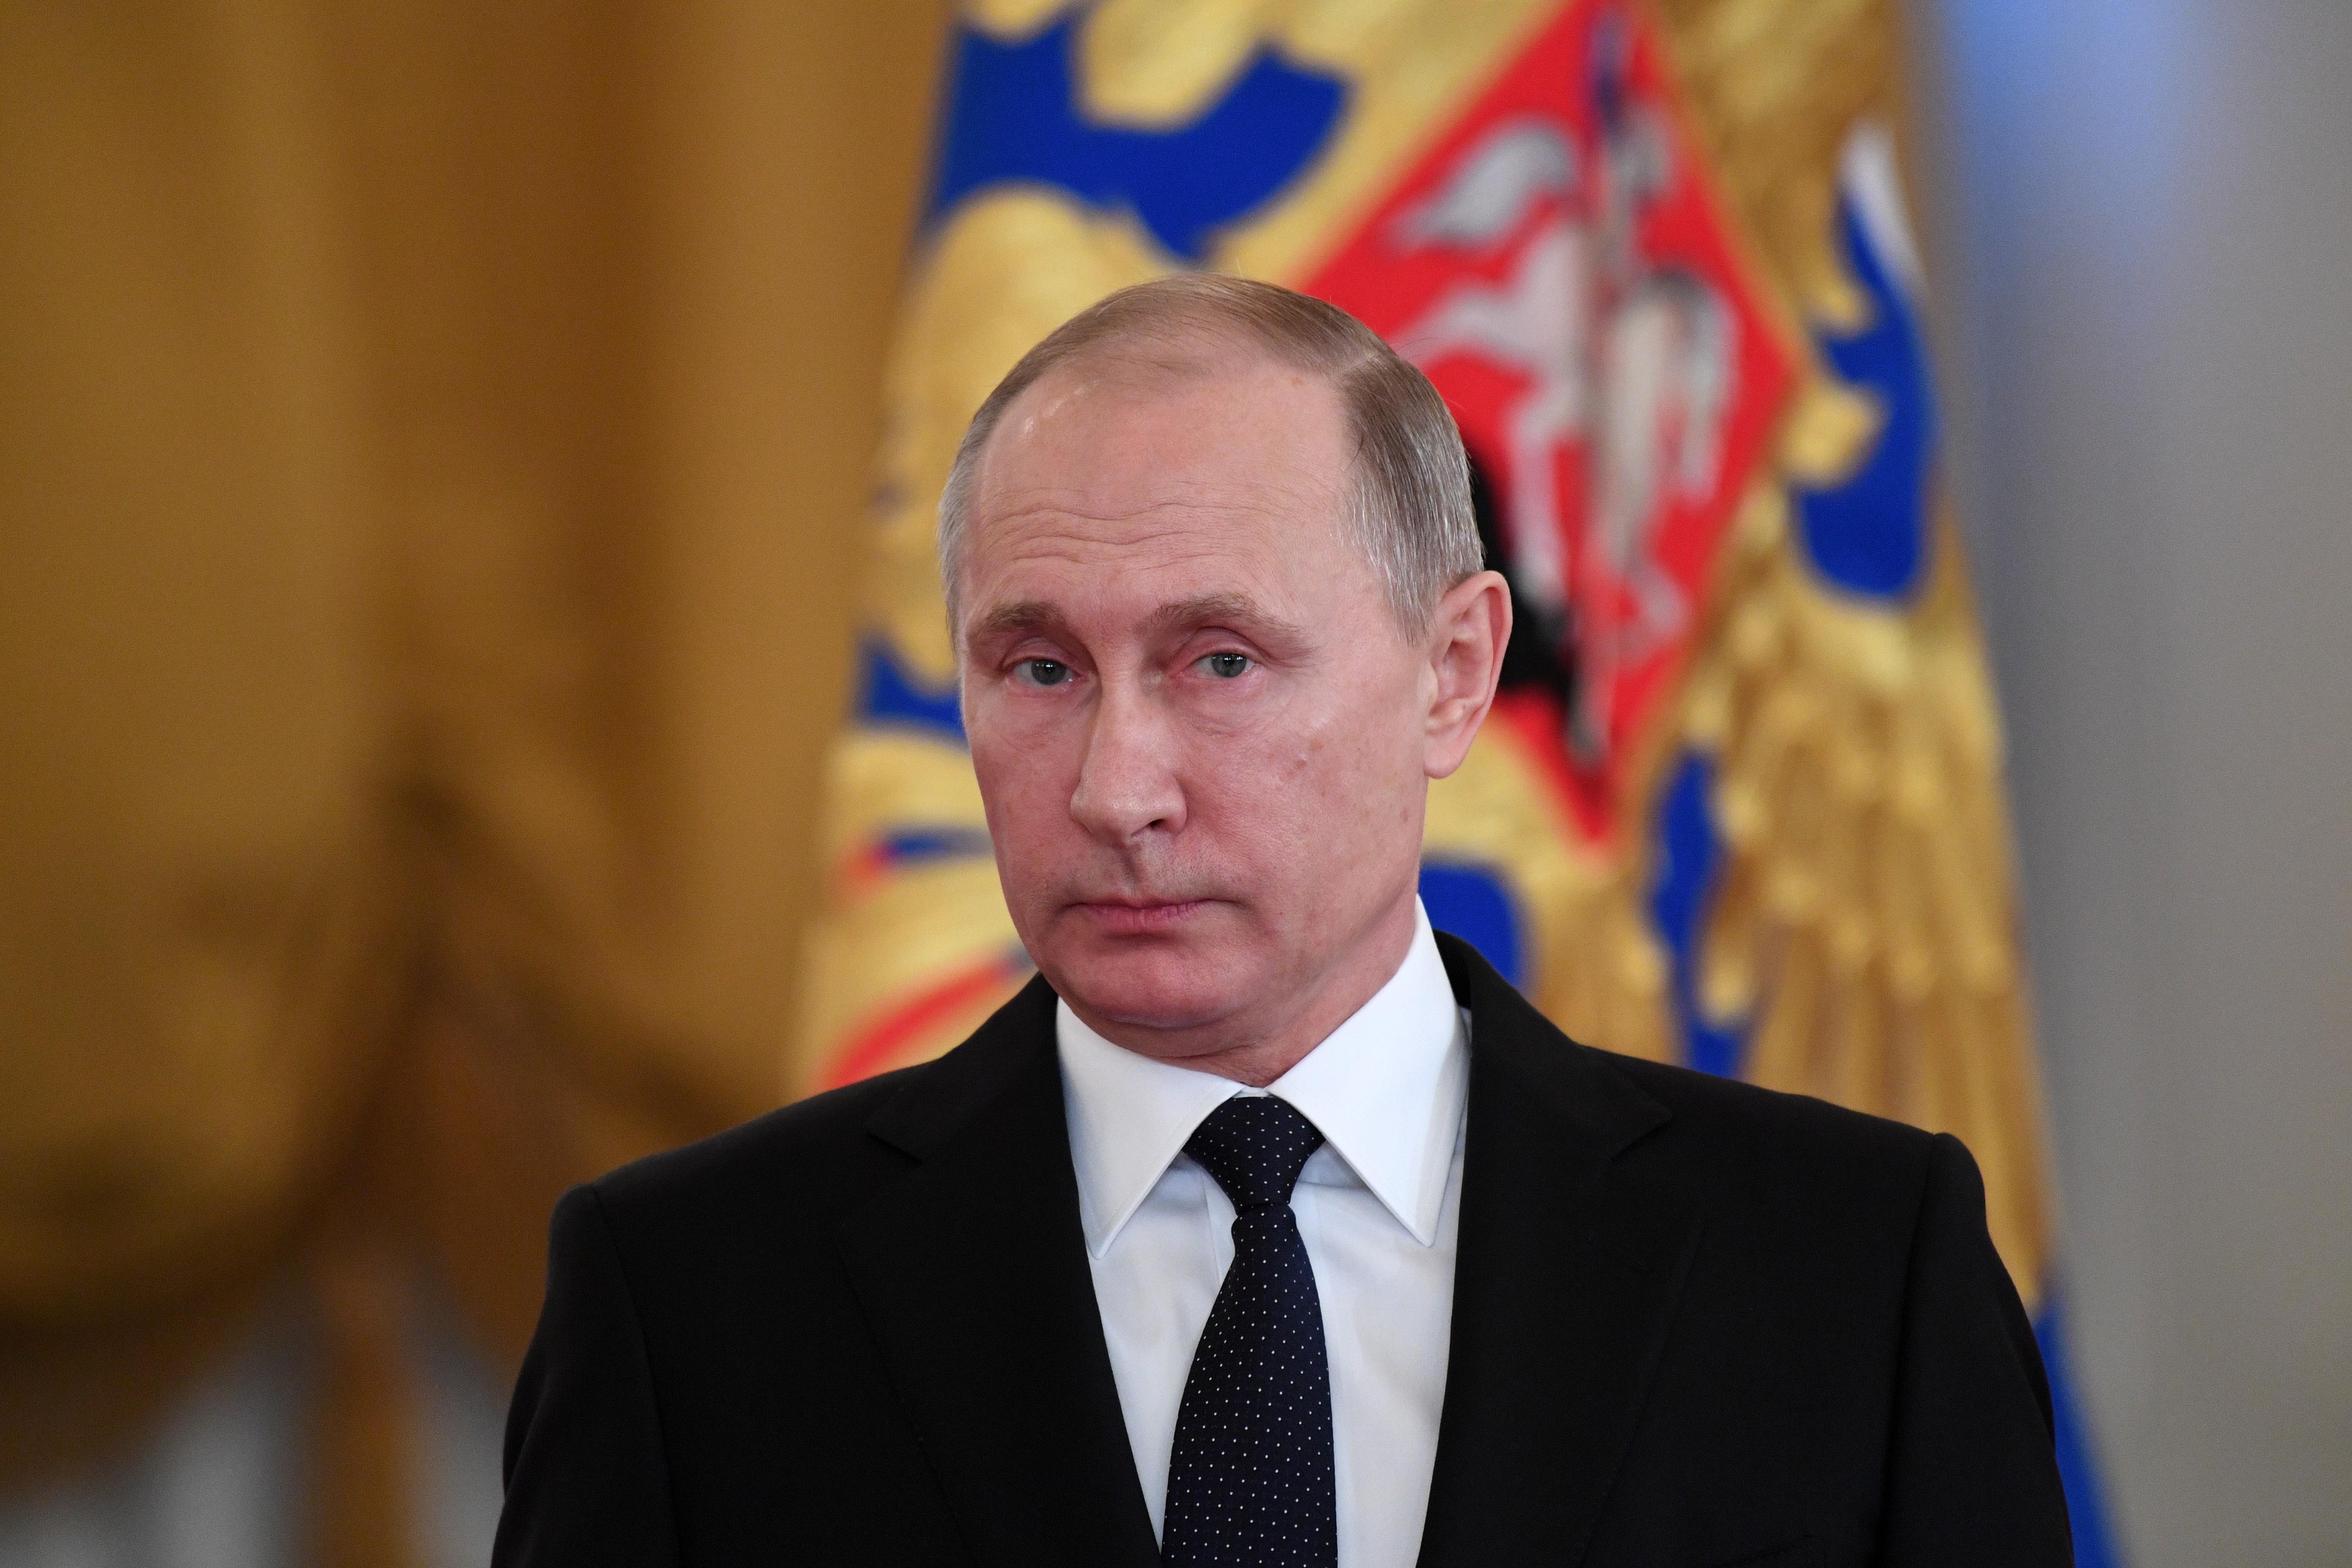 <p>Владимир Путин. Фото: &copy;РИА Новости/Григорий Сысоев</p>